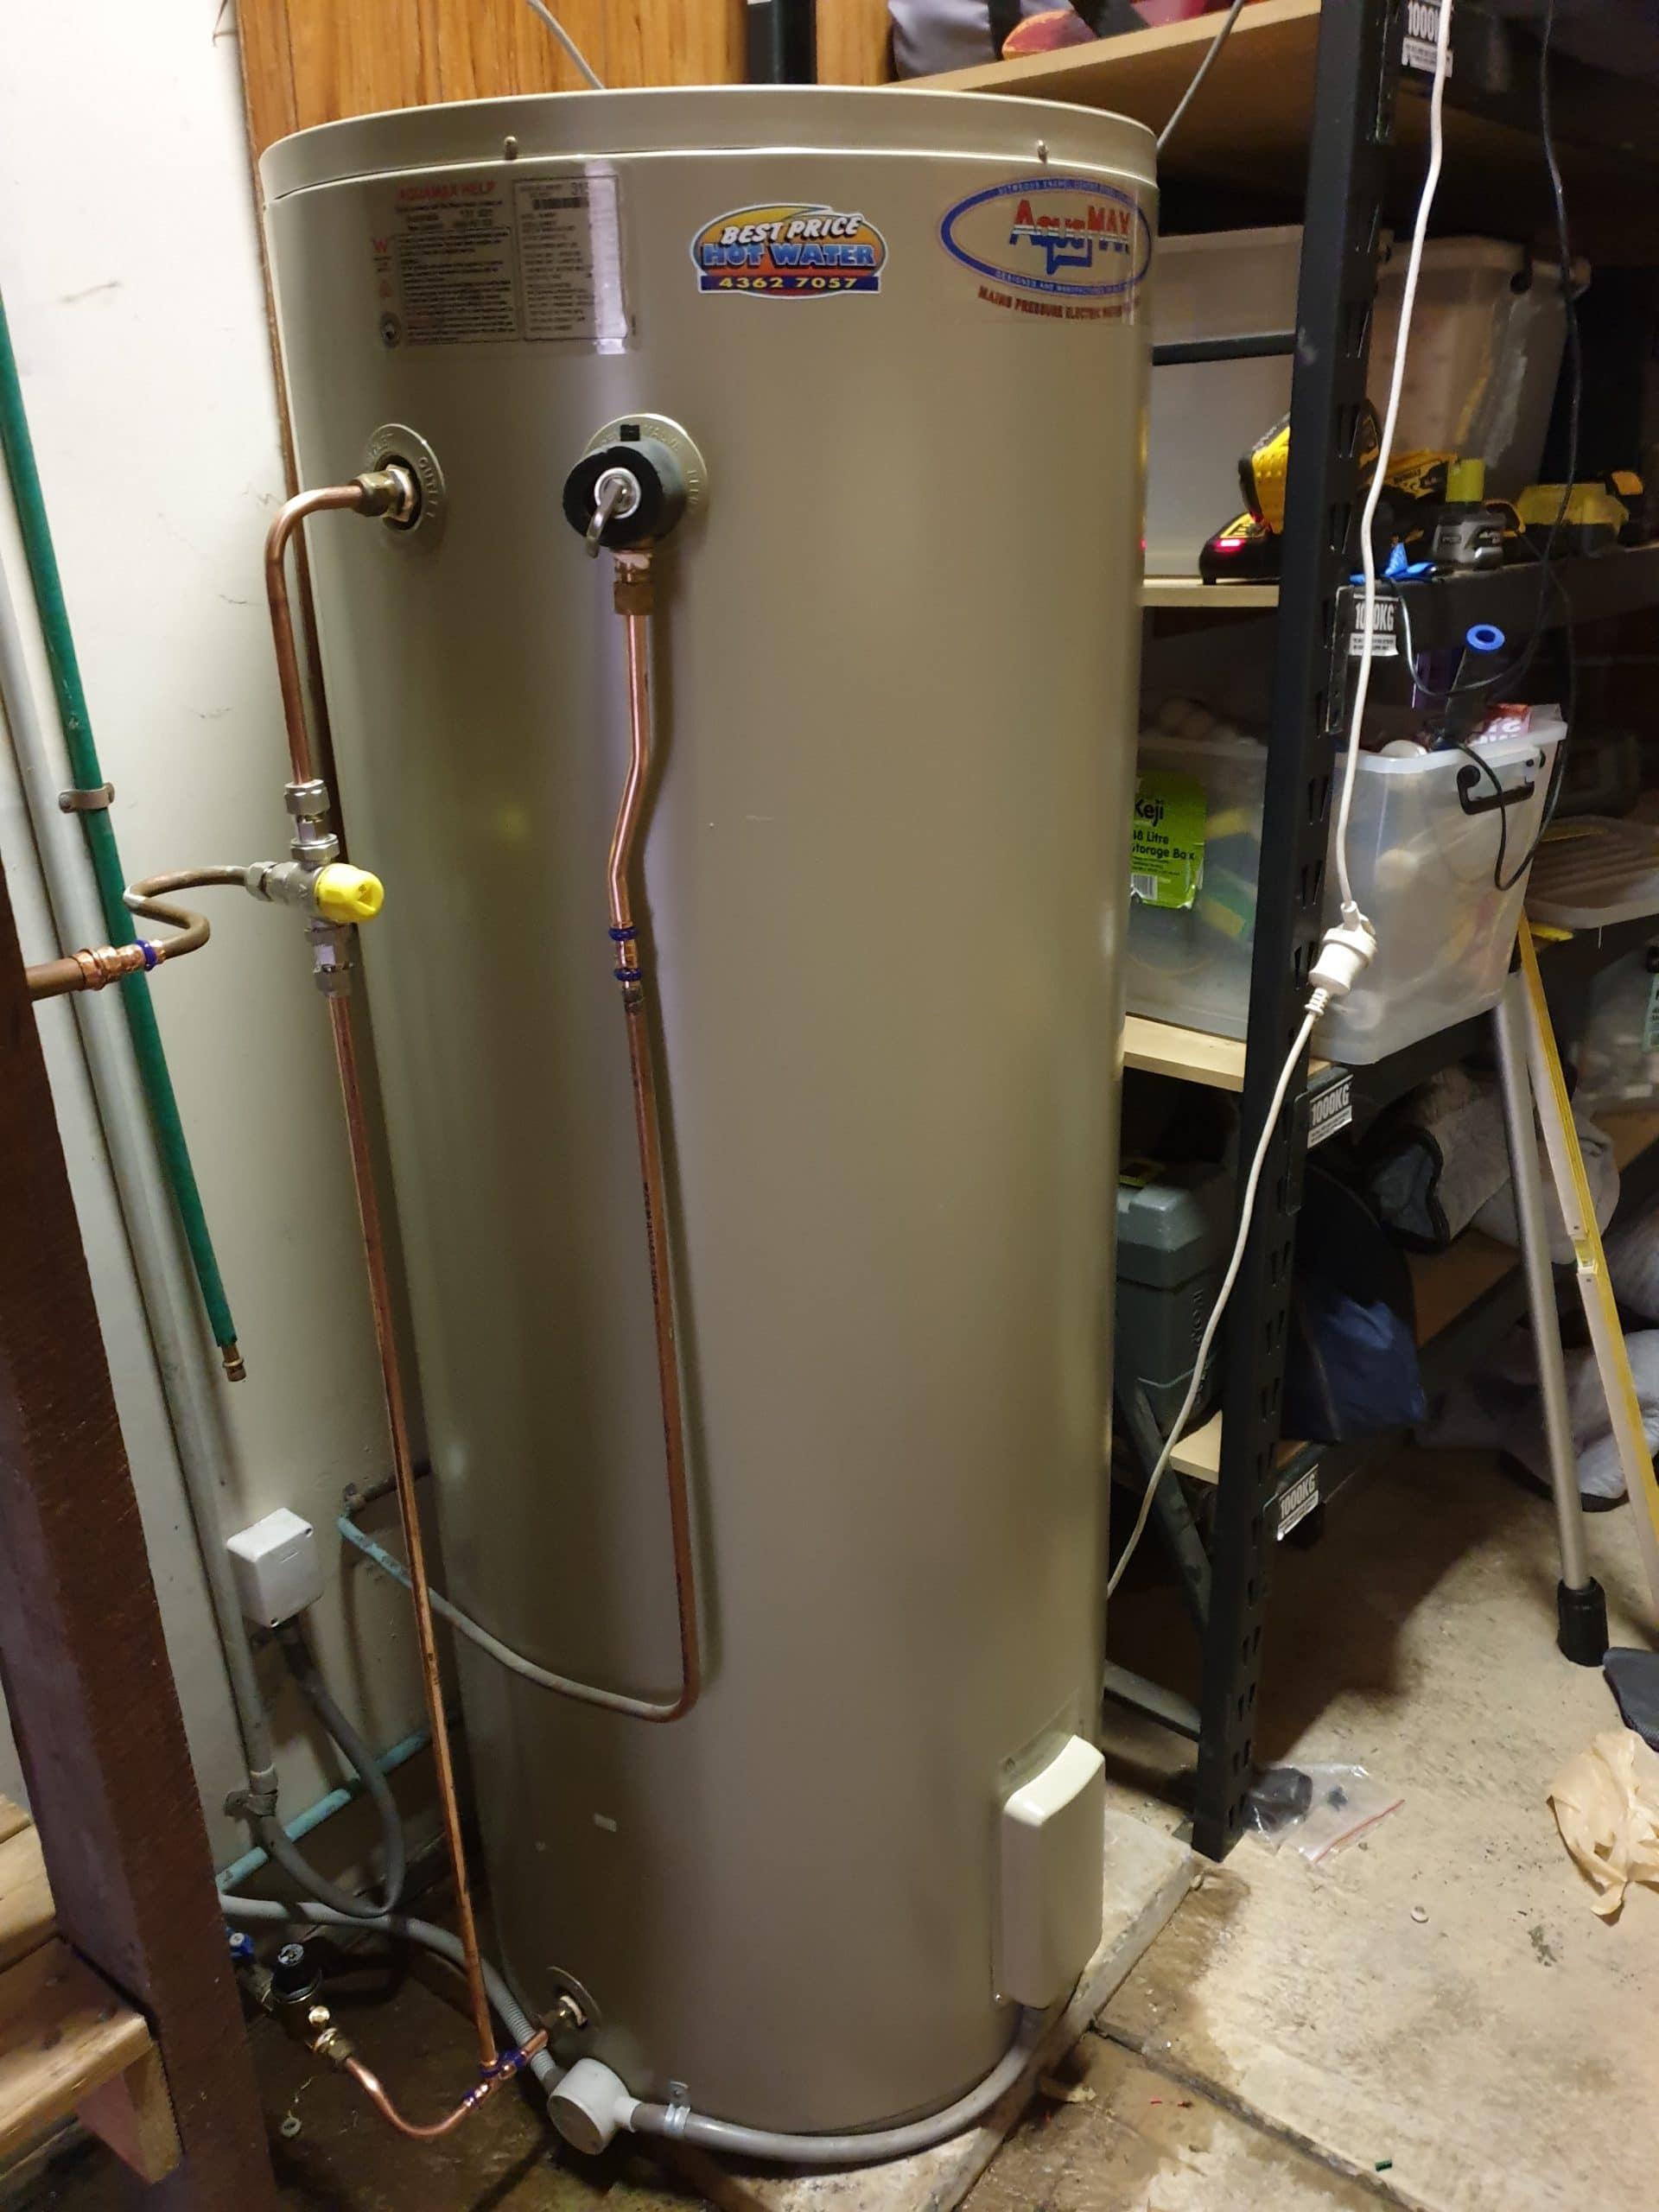 Rheem Aquamax Chittaway Bay Install